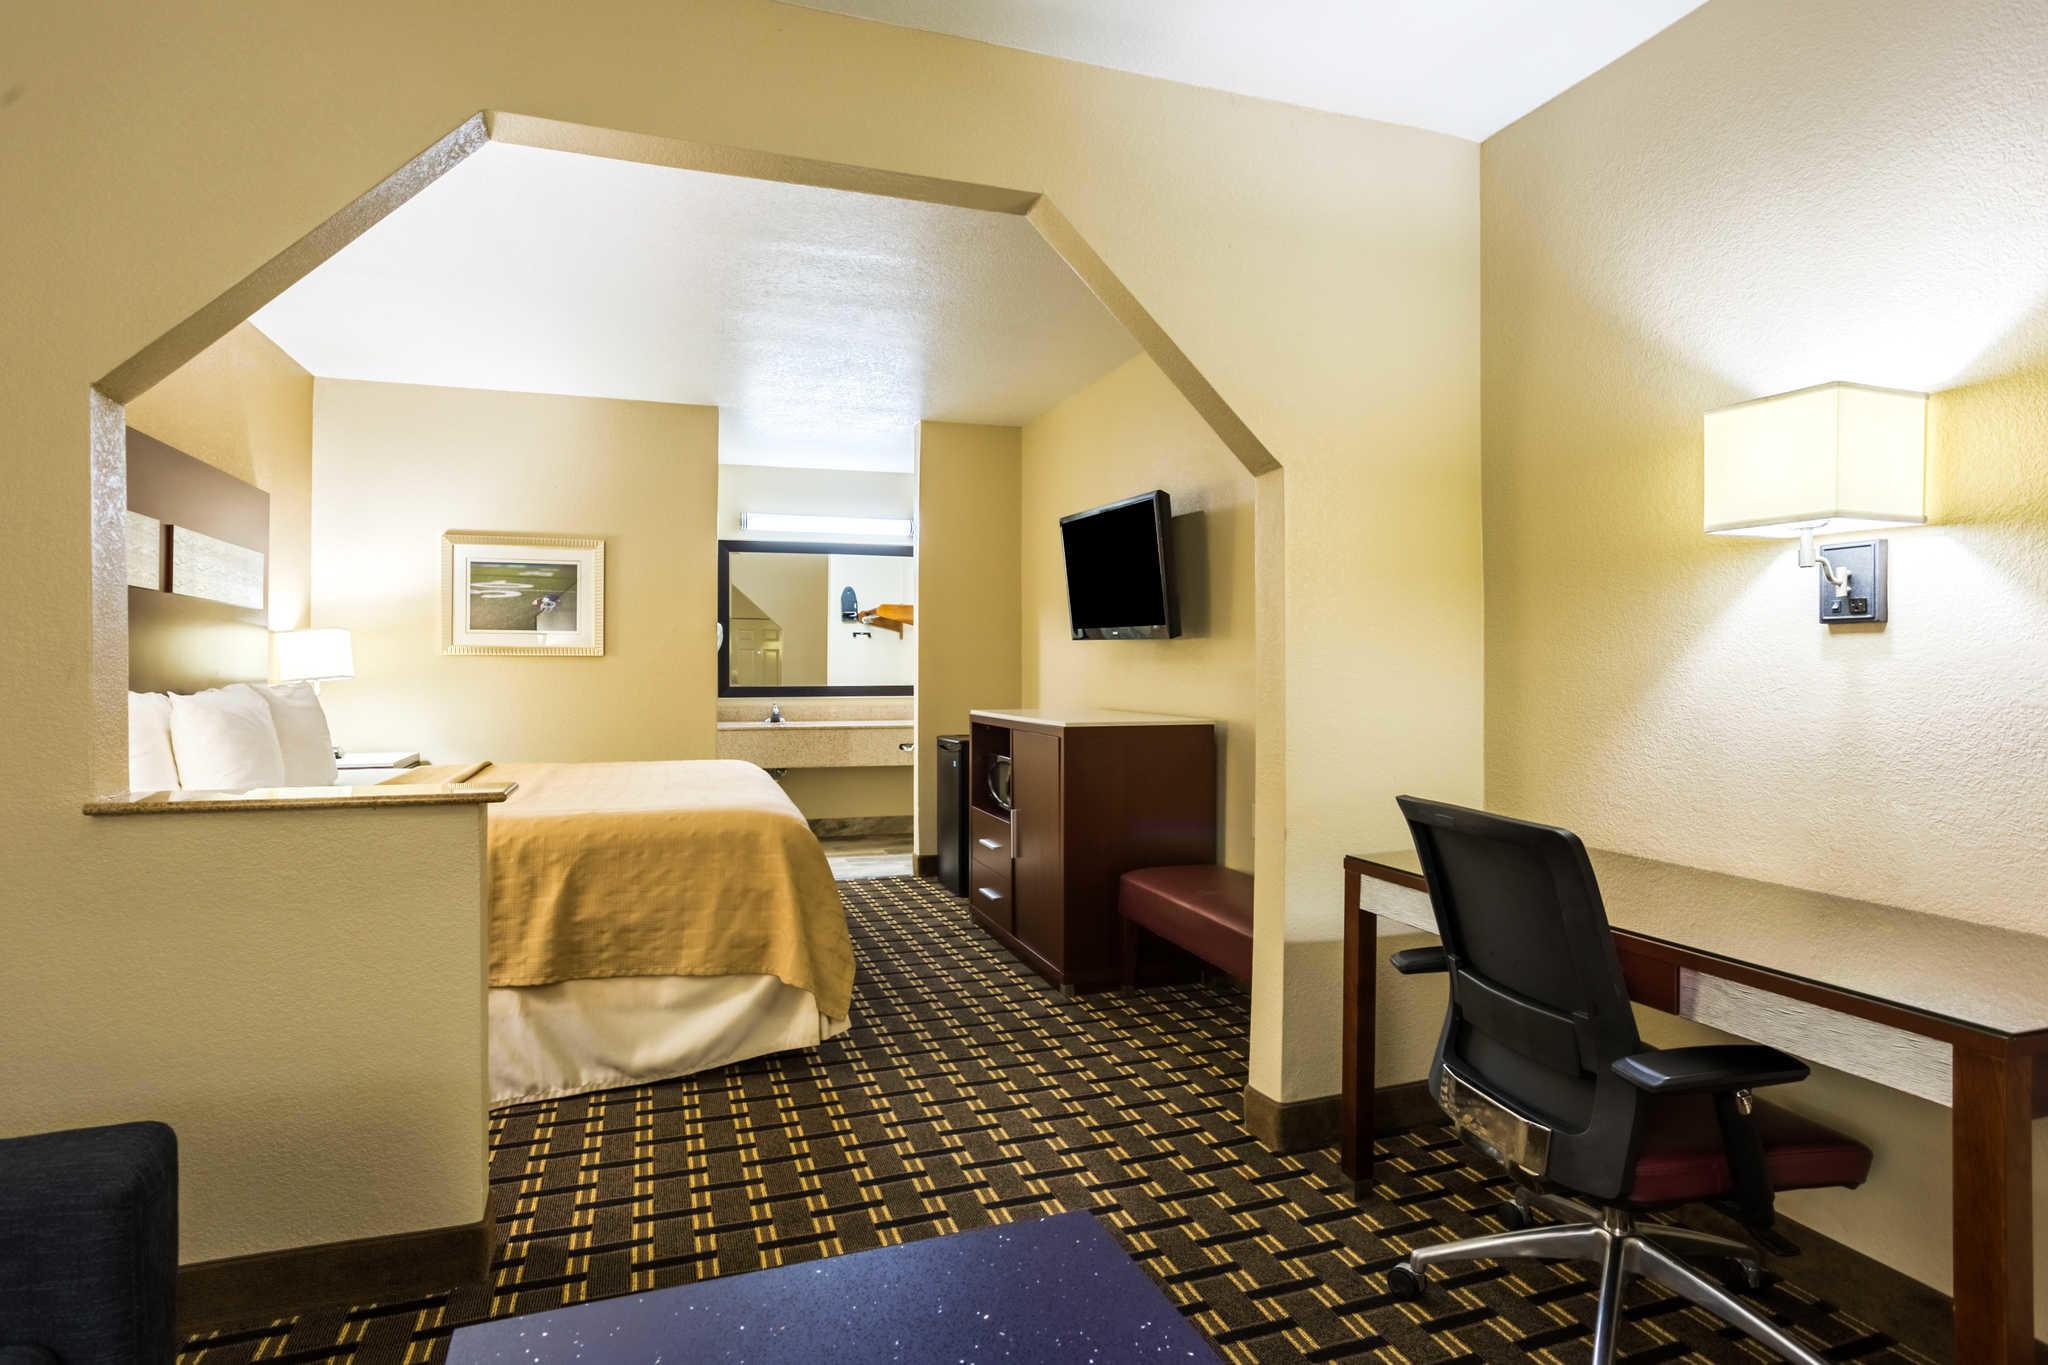 Quality Inn & Suites image 18